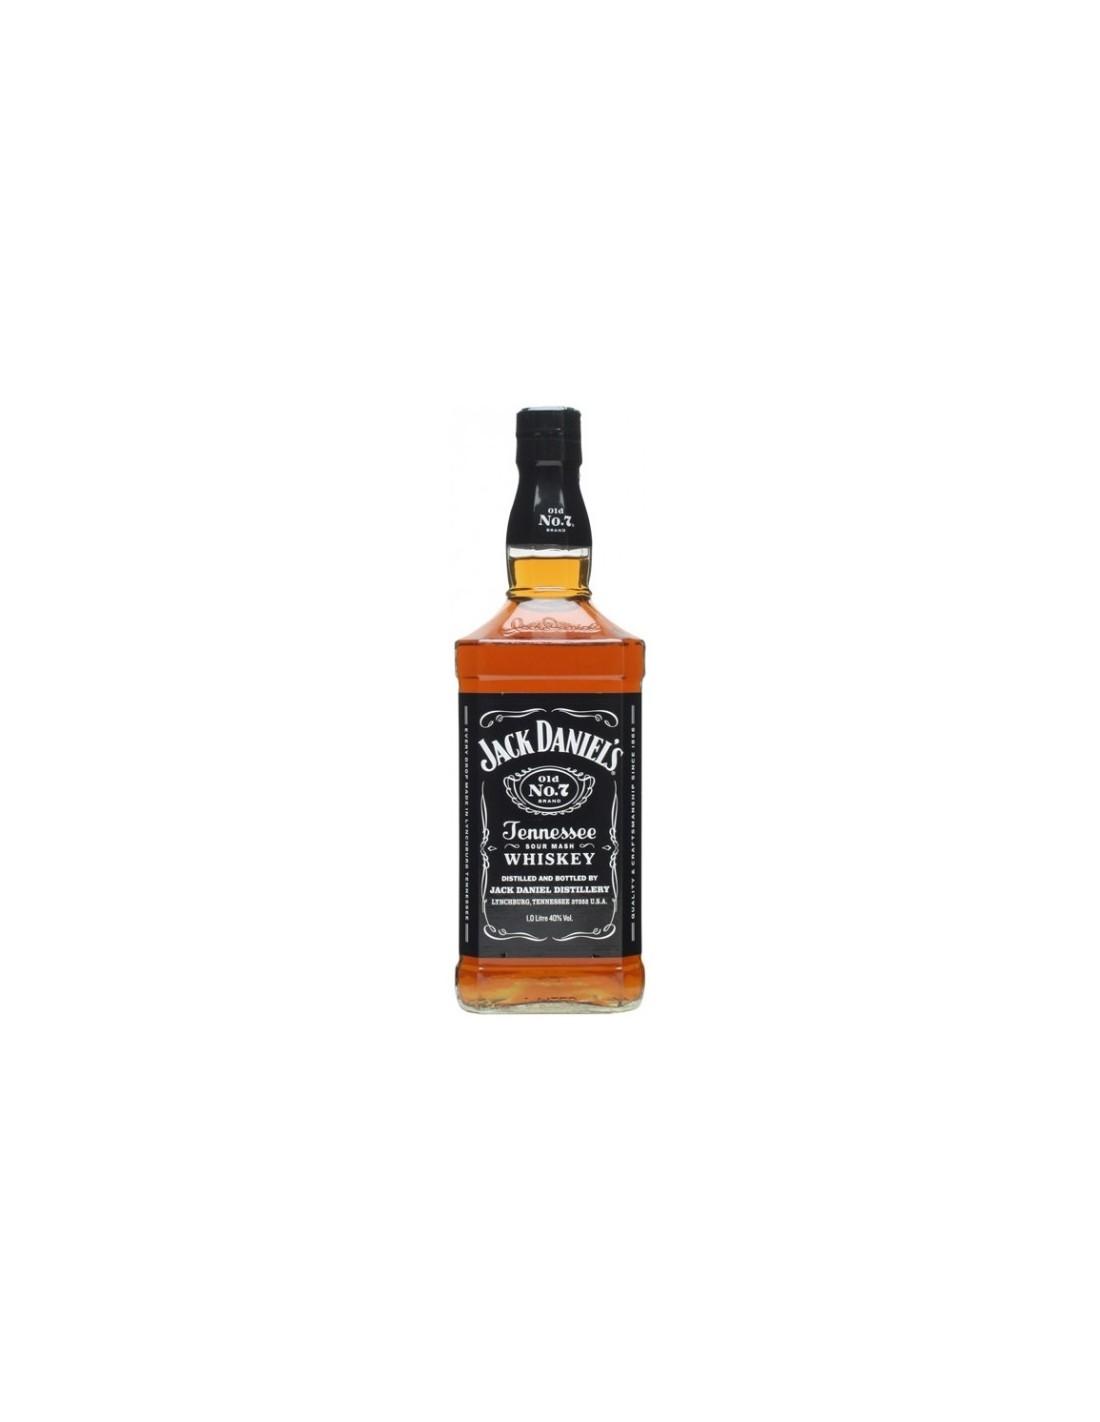 Whisky Bourbon Jack Daniel's, 40% alc., 1L, America